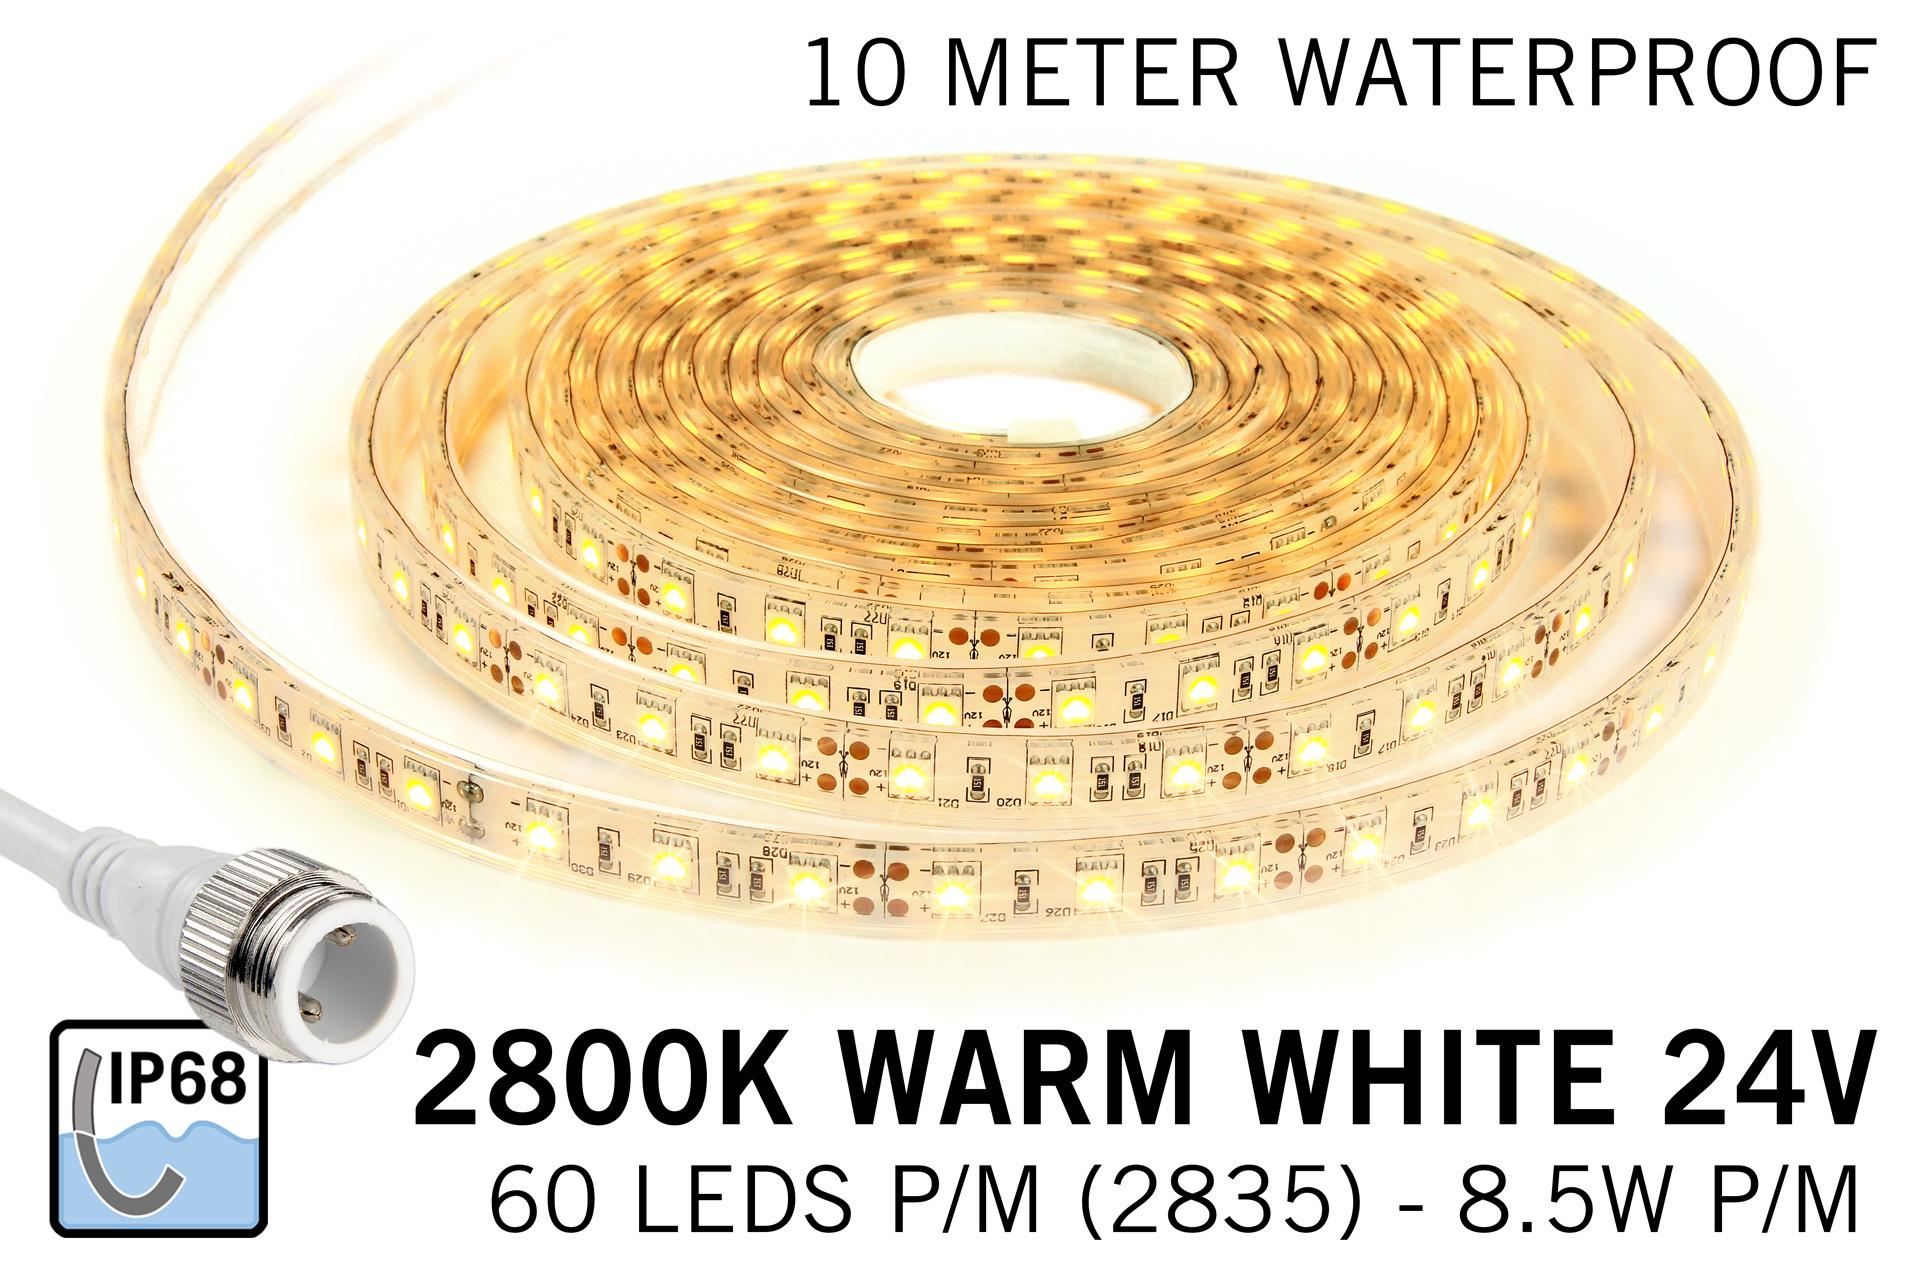 AppLamp Waterdichte Warm Witte LED strip (IP68) 60 Led's per meter 24Volt, 10 meter lengte